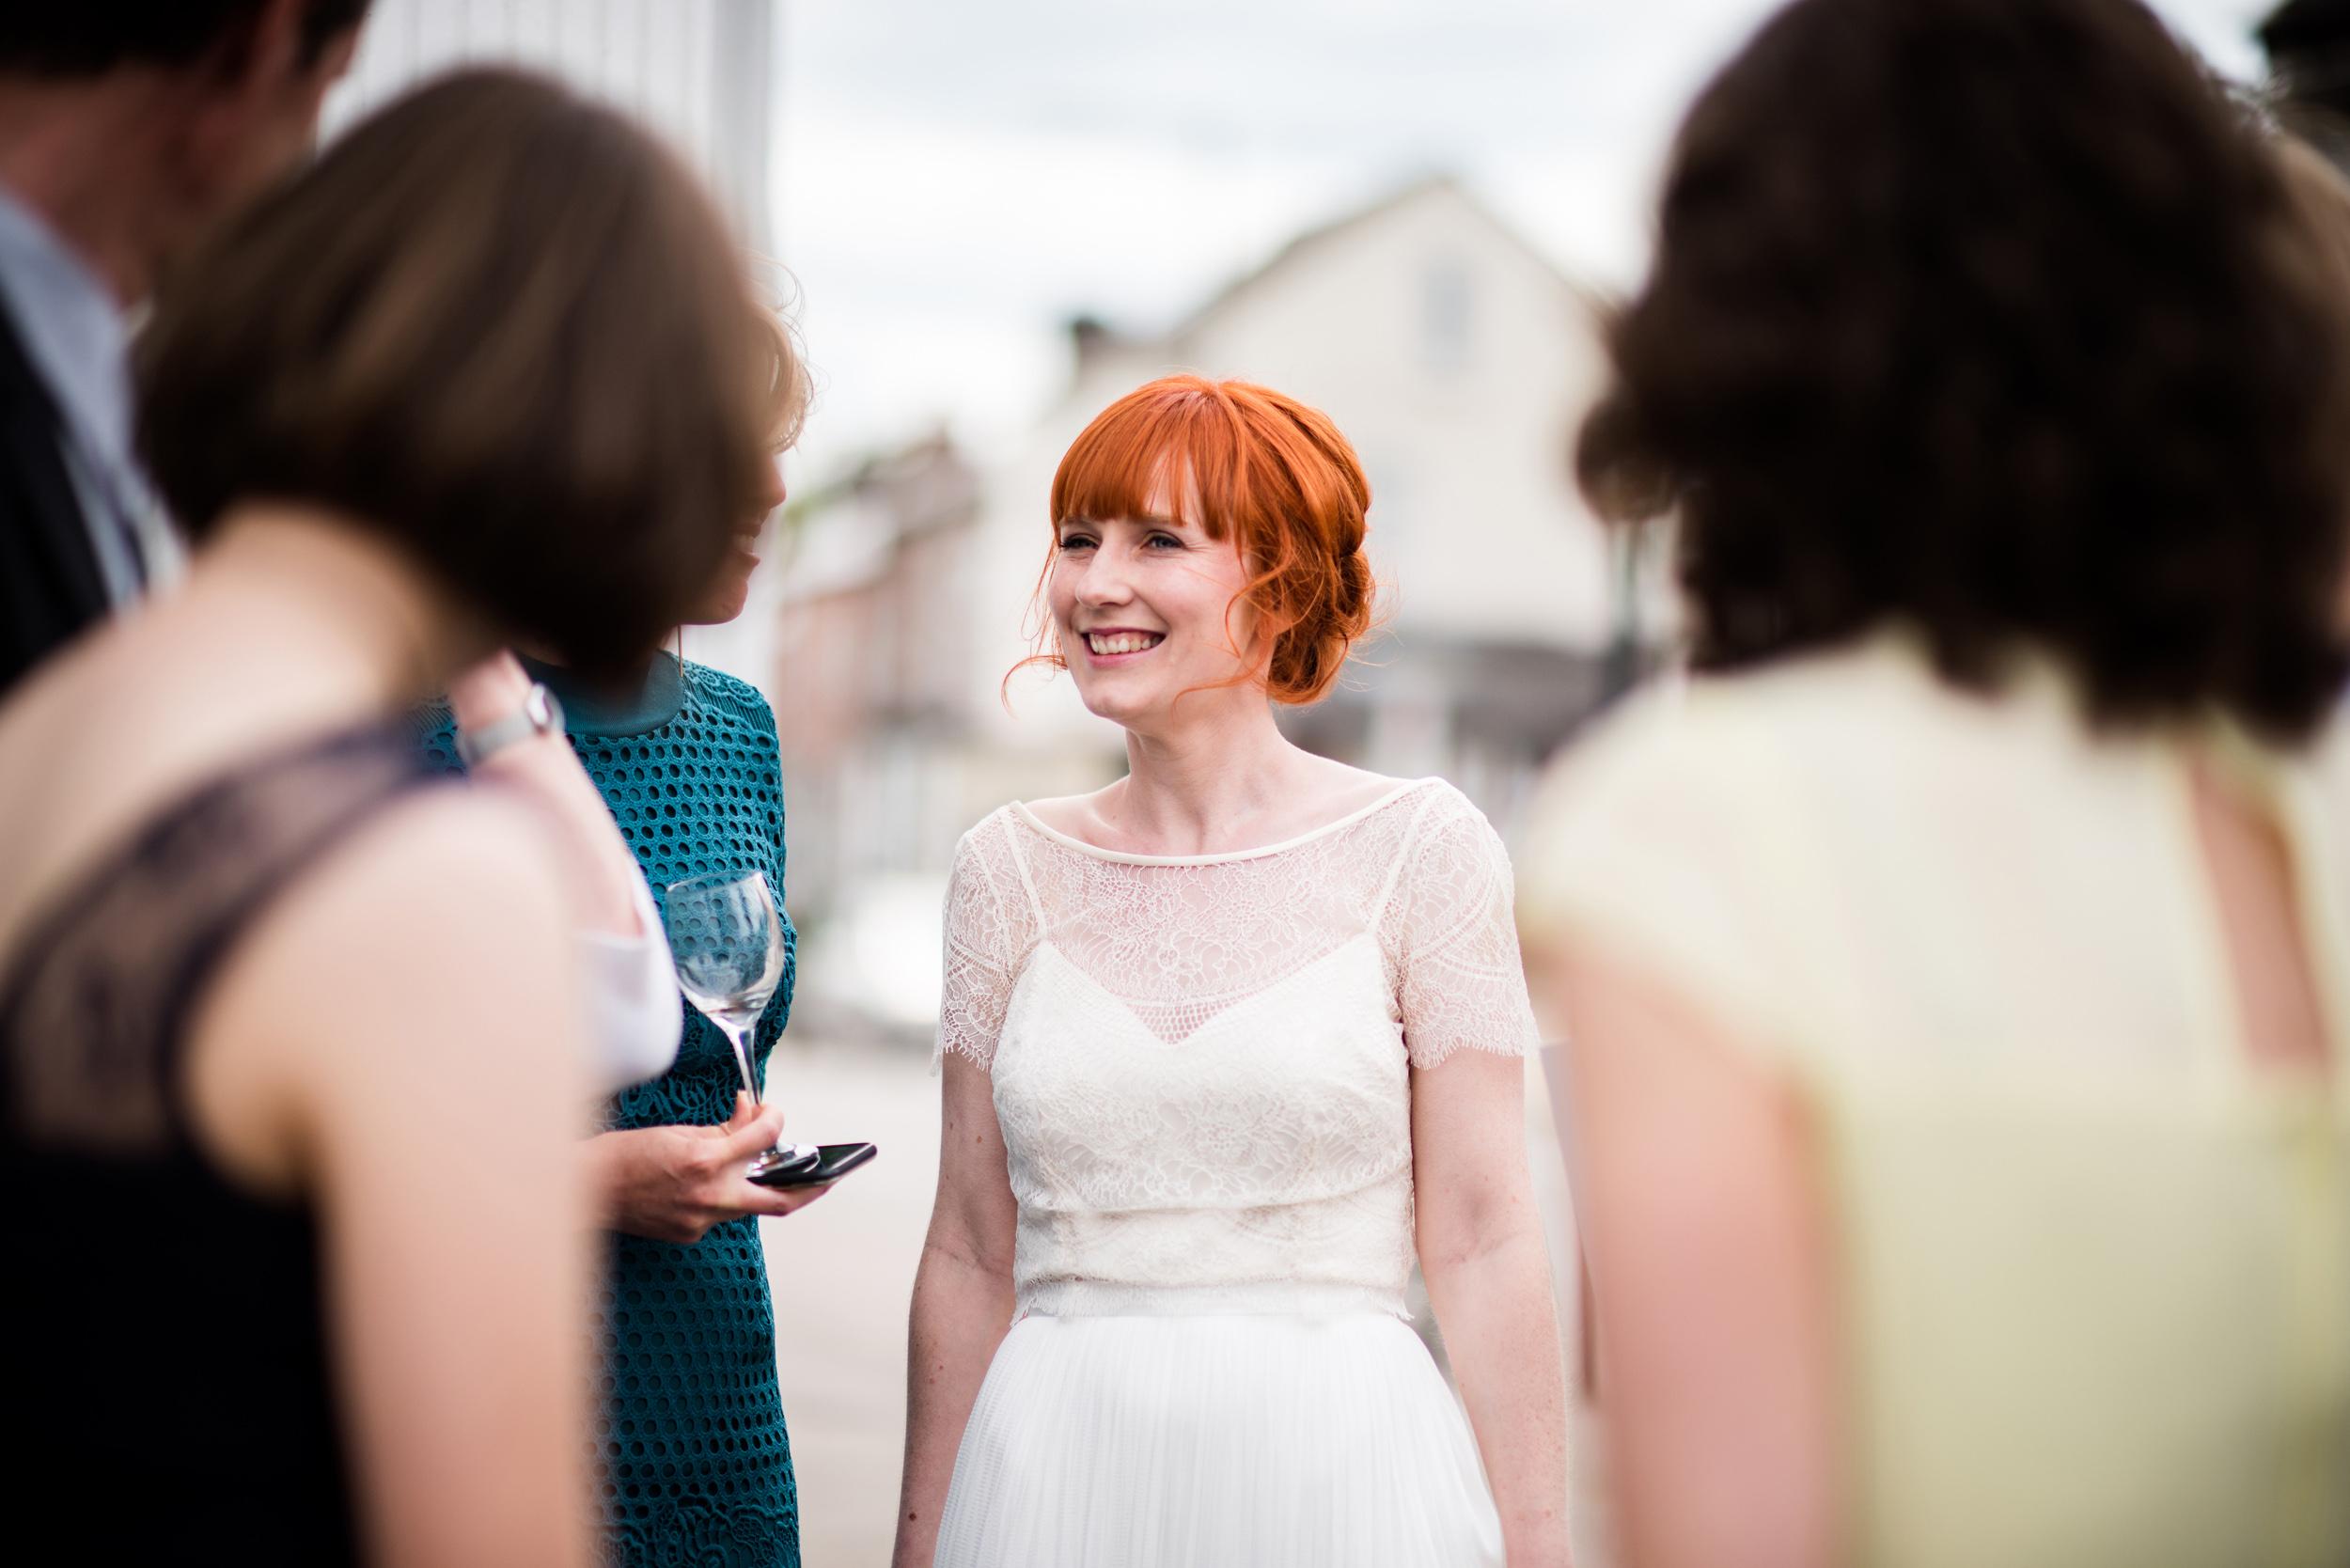 Jill-Kate-Beaumont-Lace-Sheffield-Wedding-16.jpg